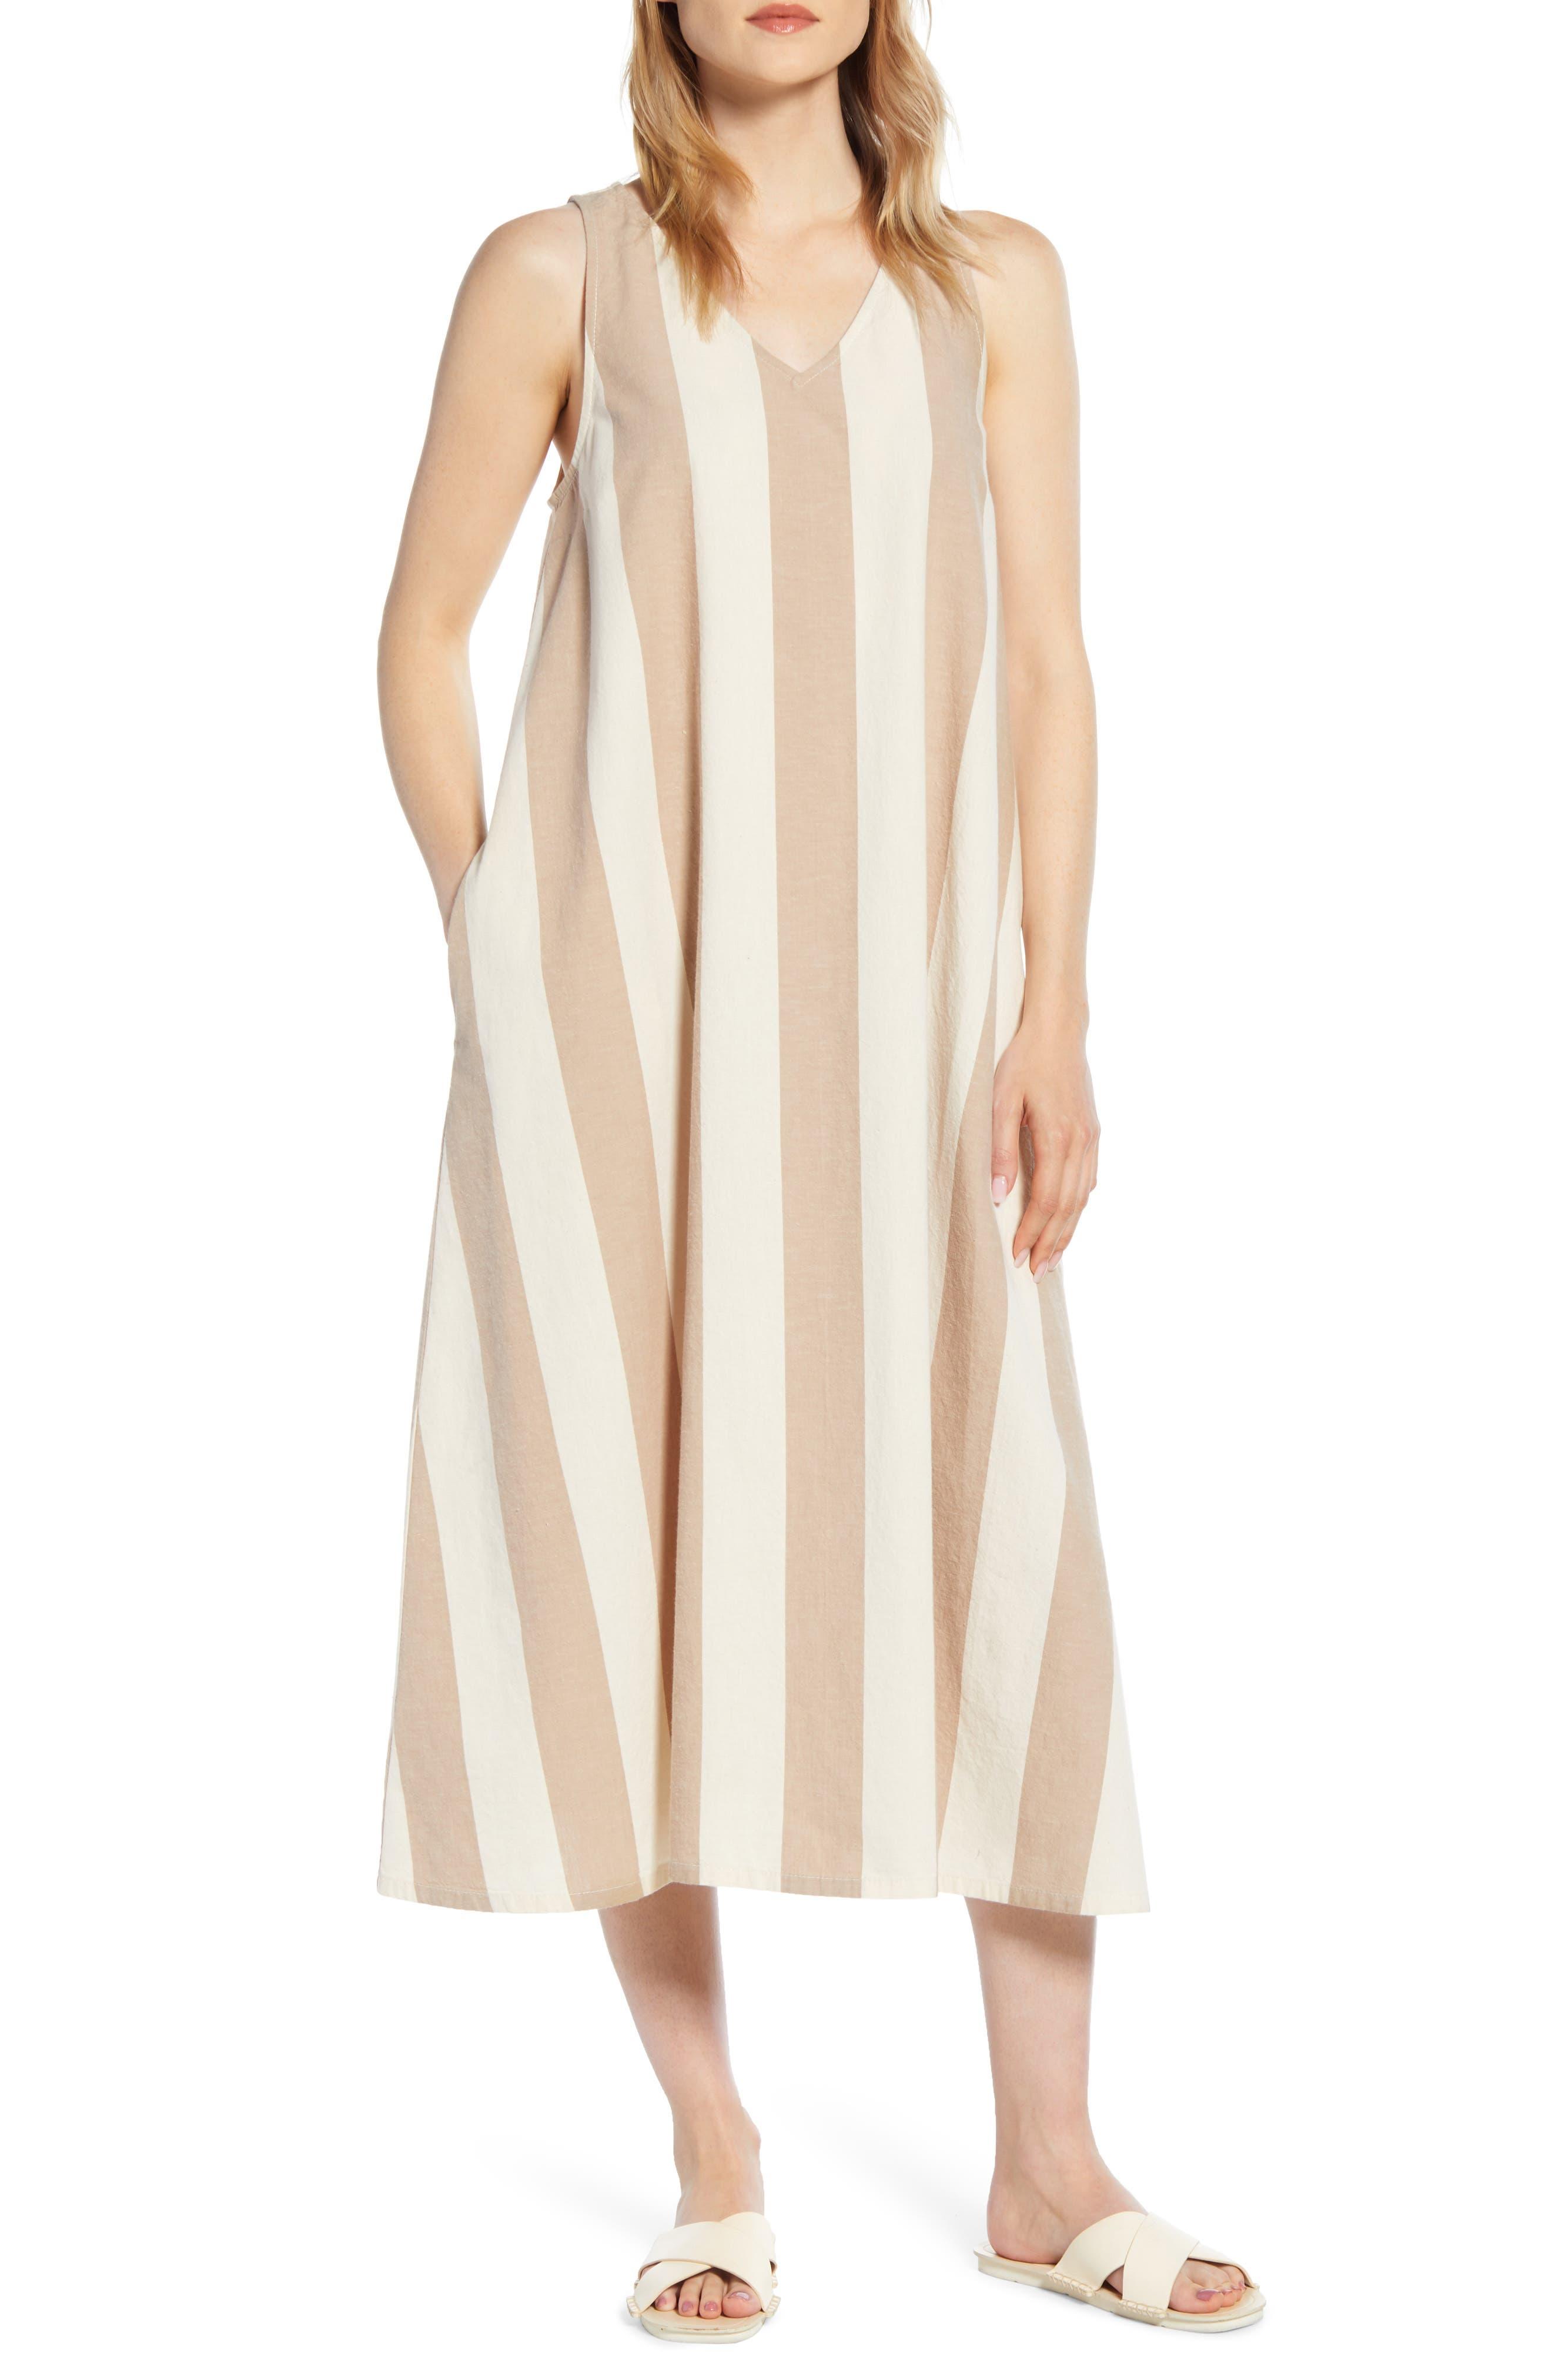 Lou & Grey Stripe V-Neck Dress, White